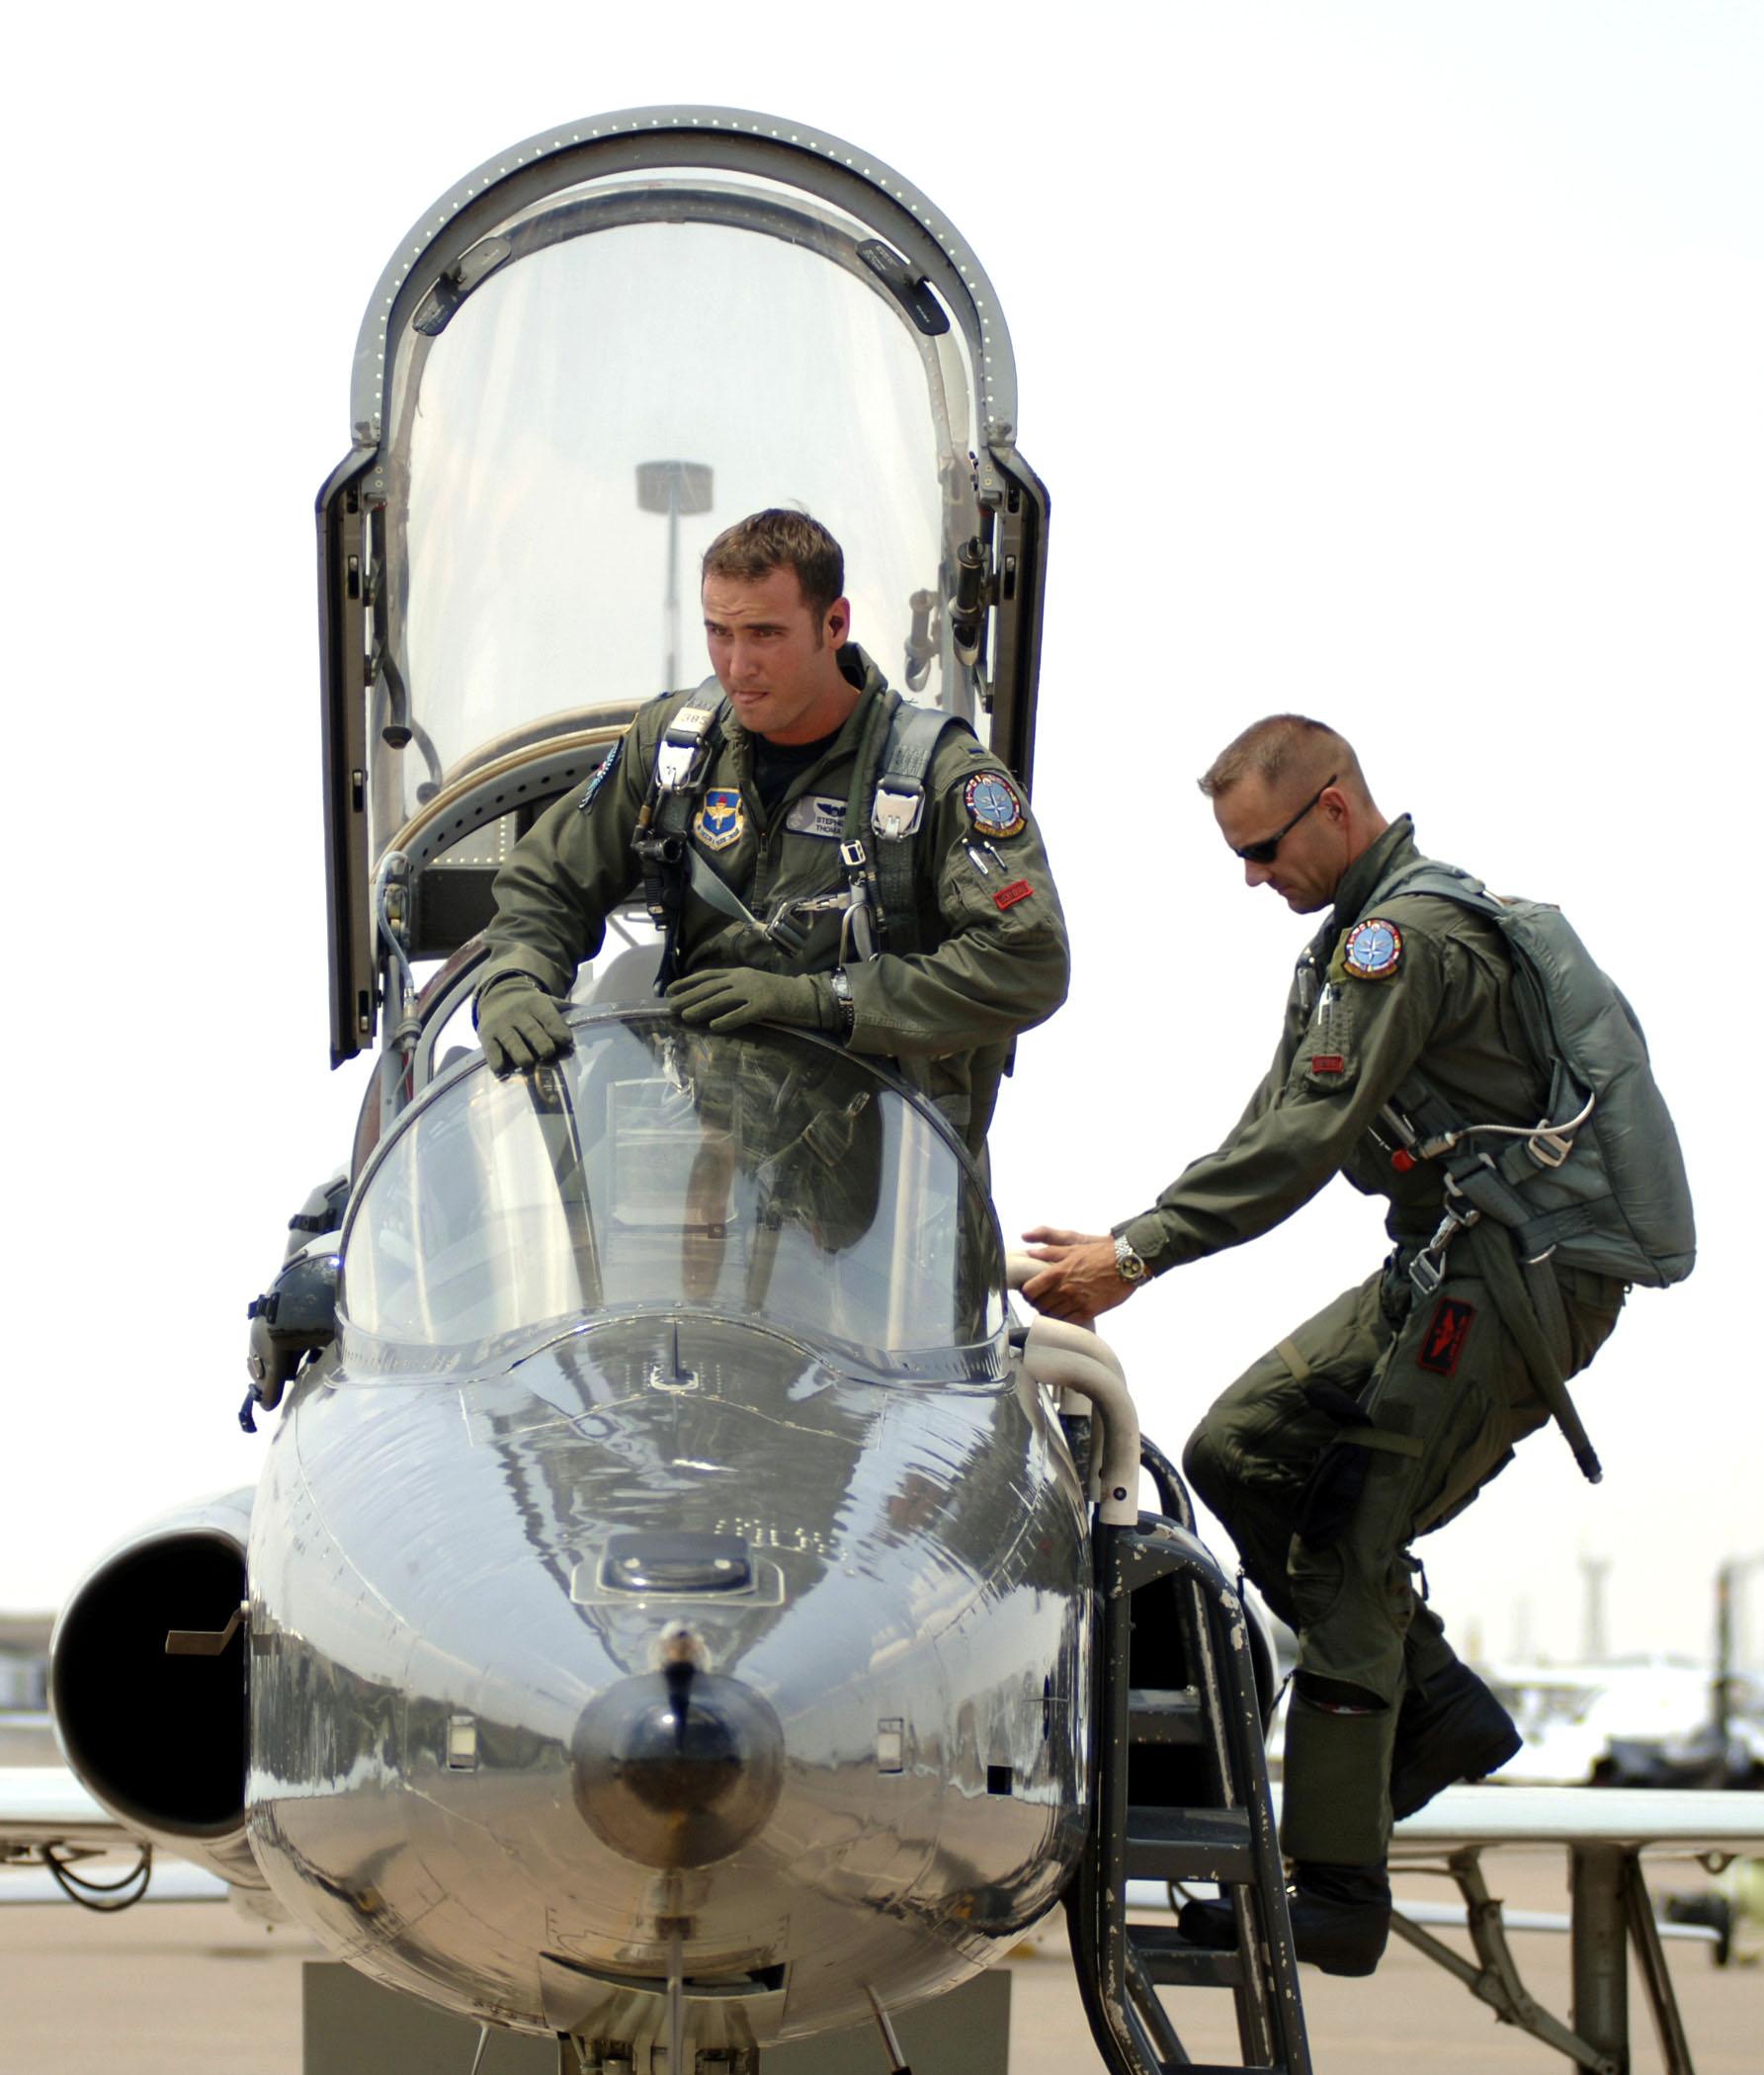 T-38 Talon > Sheppard Air Force Base > Display